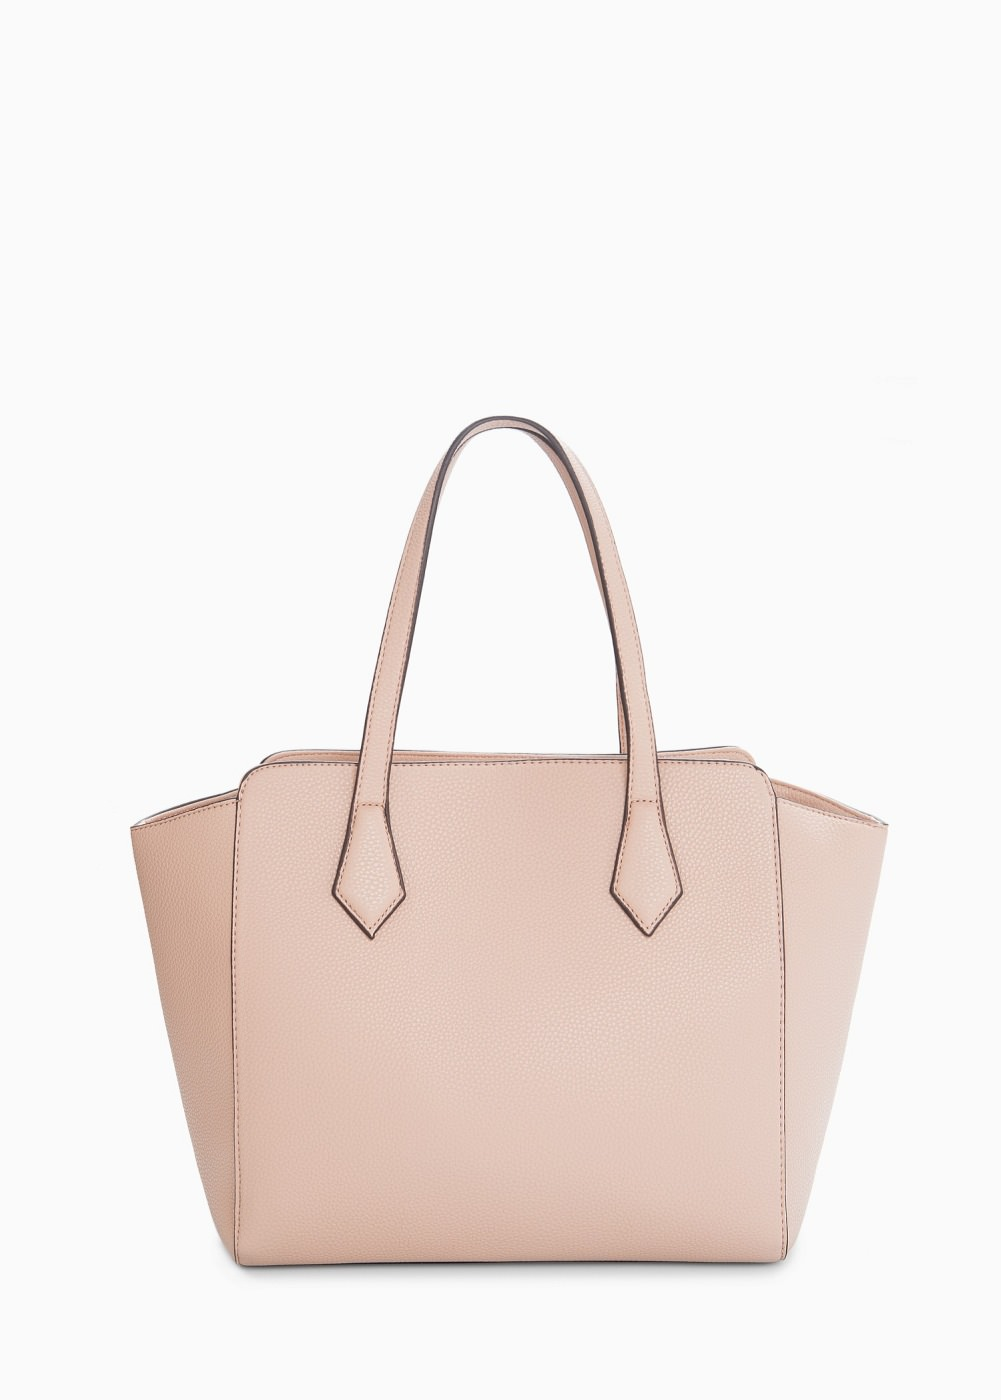 Pebbled Tote Bag , sale $39.99